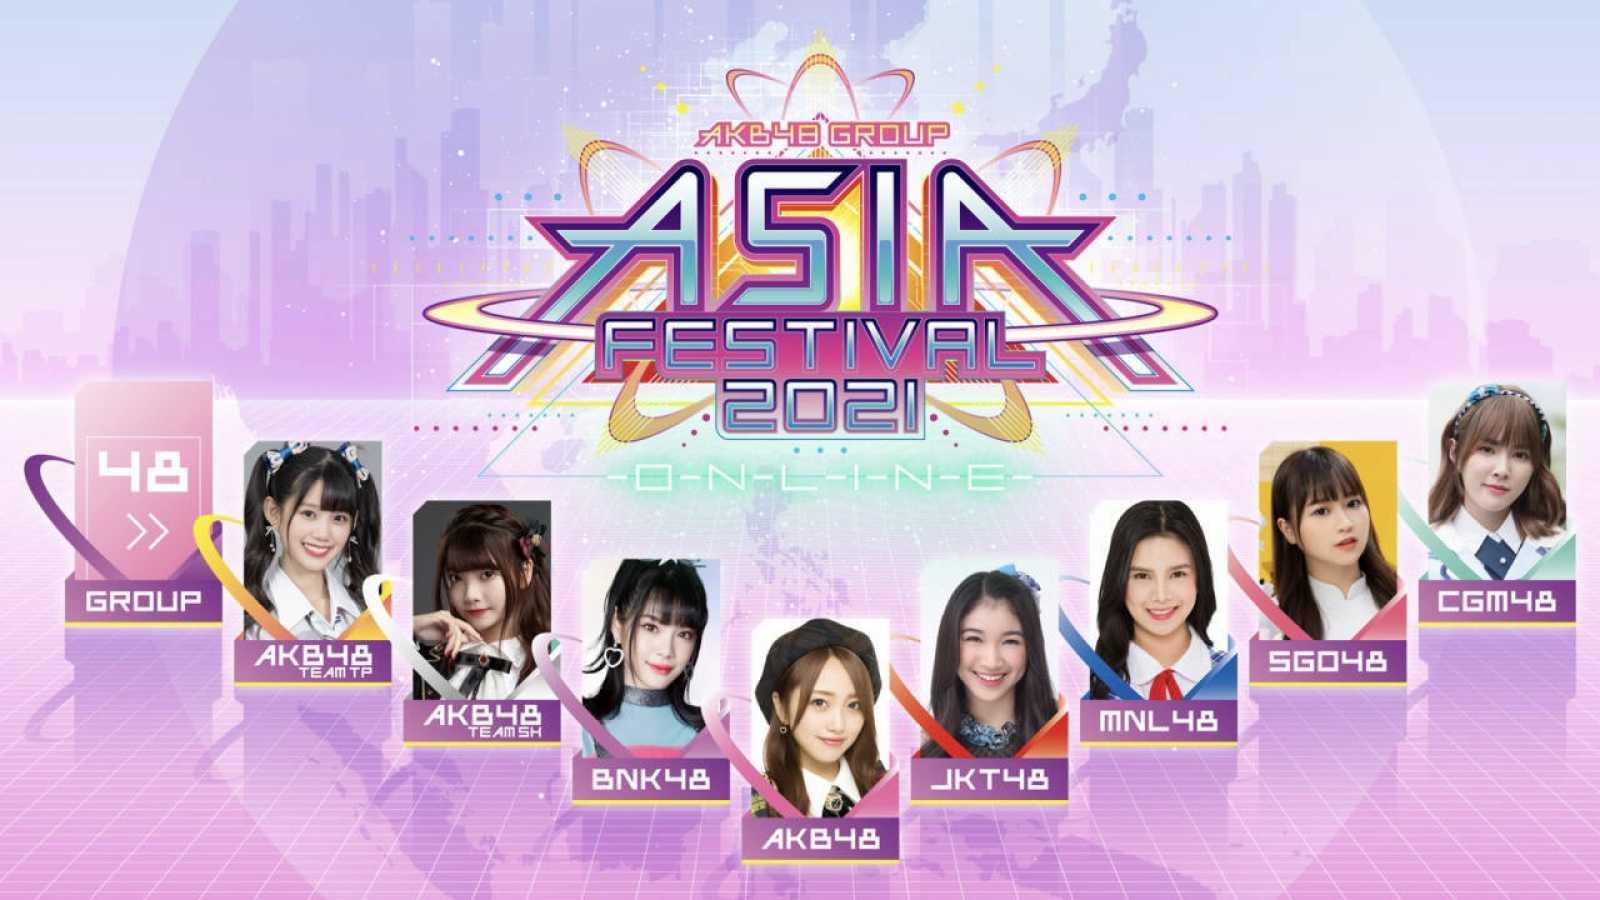 AKB48 to Live Stream Online Festival Worldwide © Vernalossom Co., Ltd. All rights reserved.